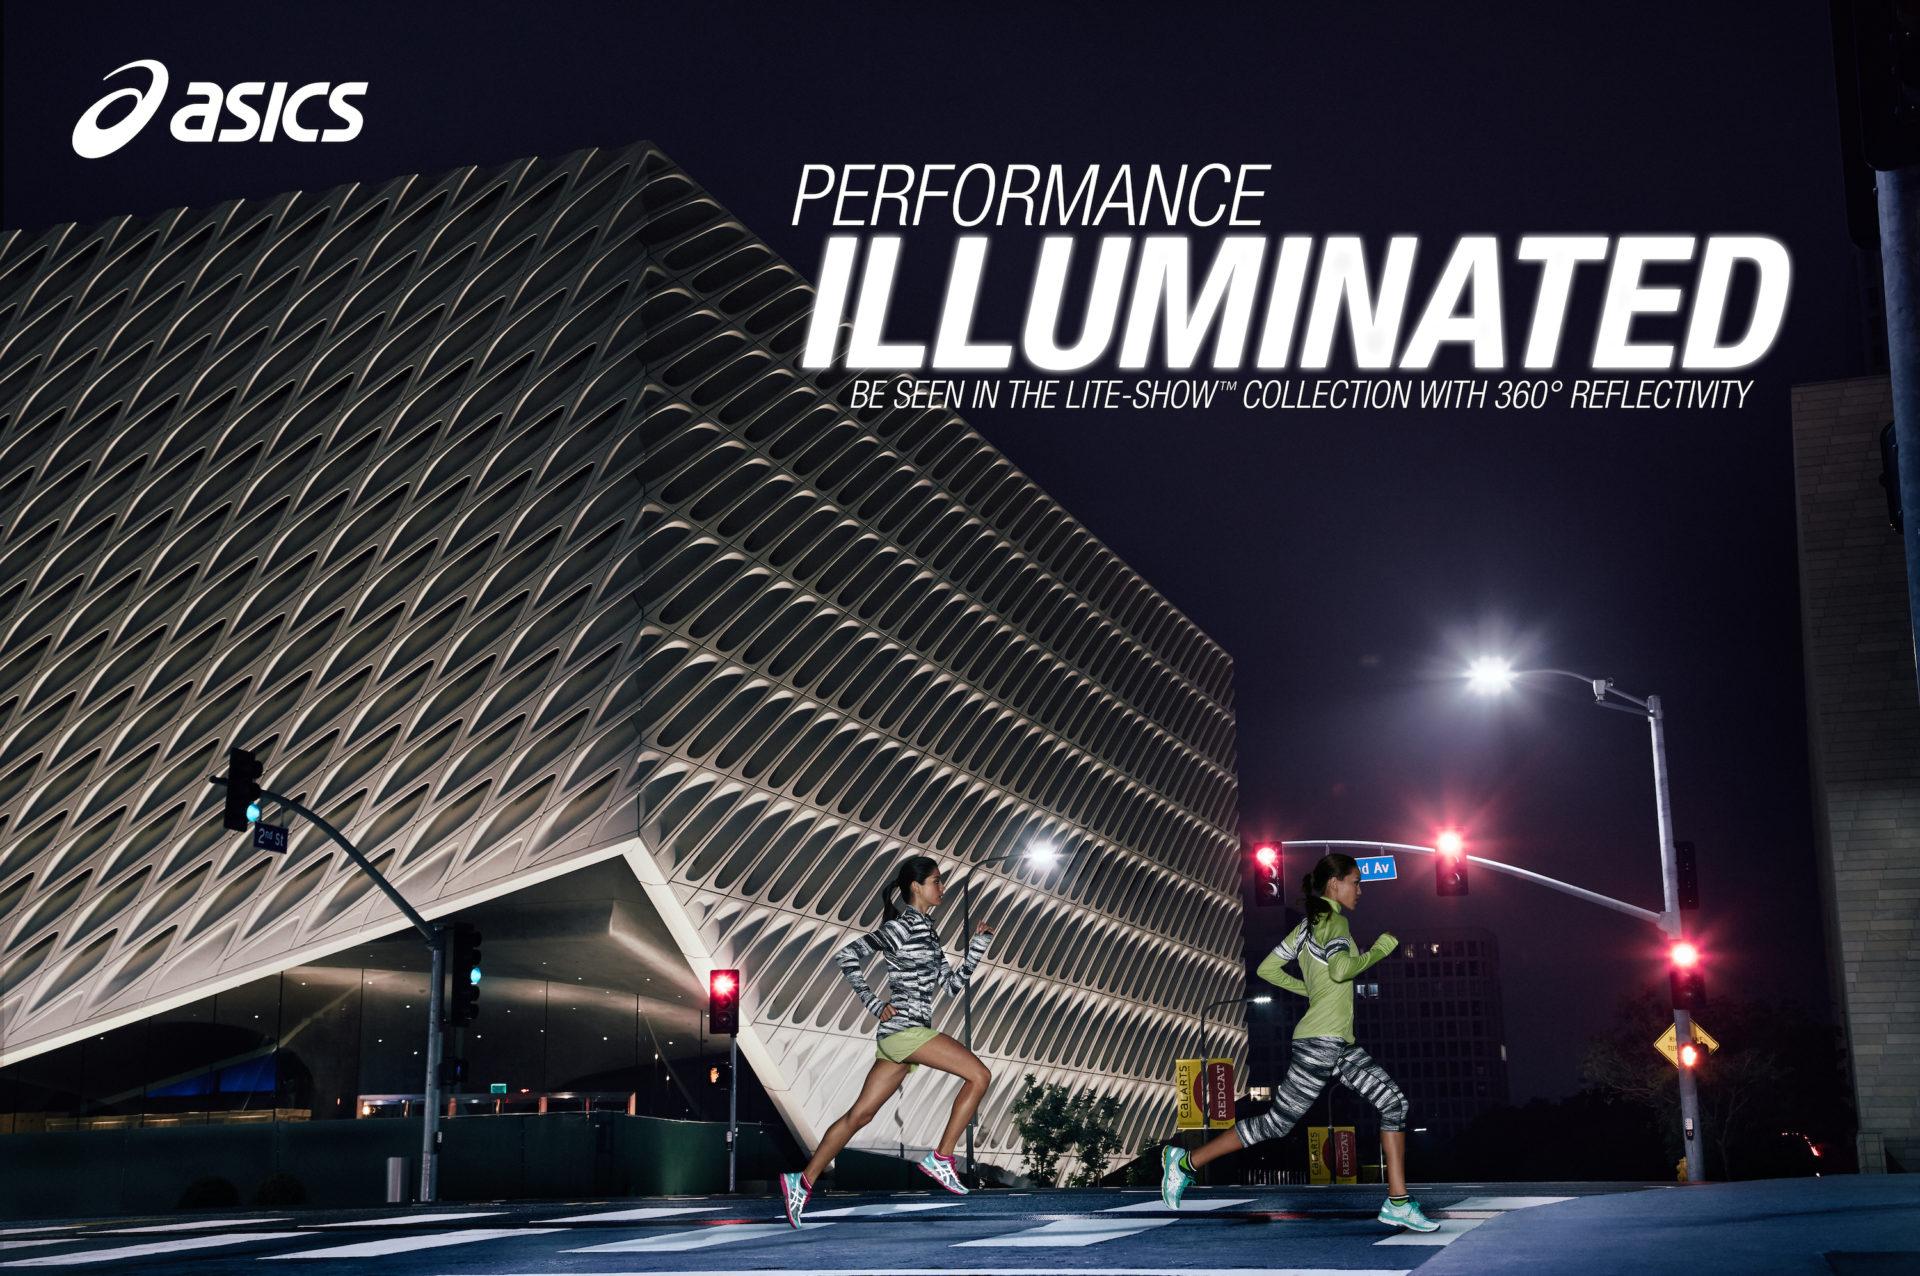 Asics Performance Illuminated Campaign